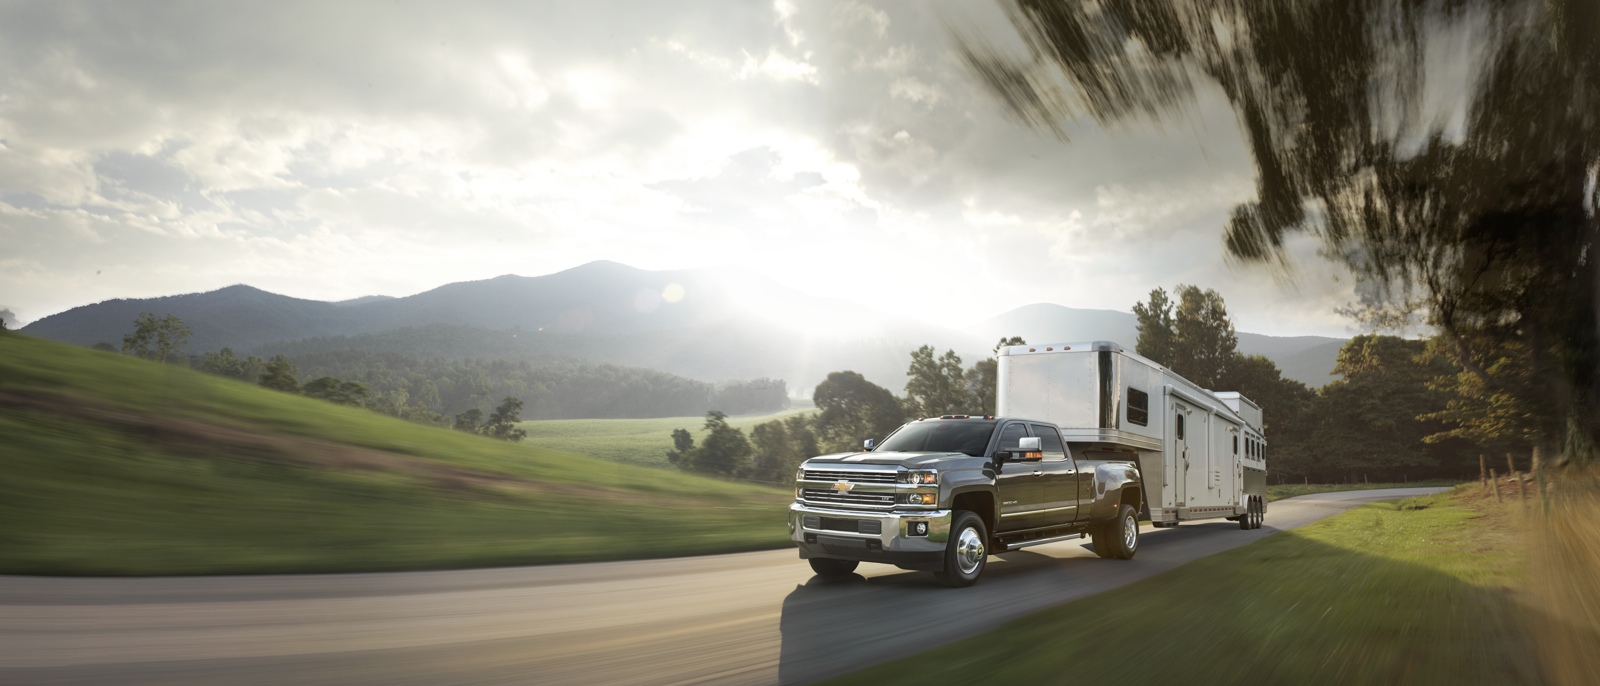 2015 Chevrolet Silverado 1500 tow trailer